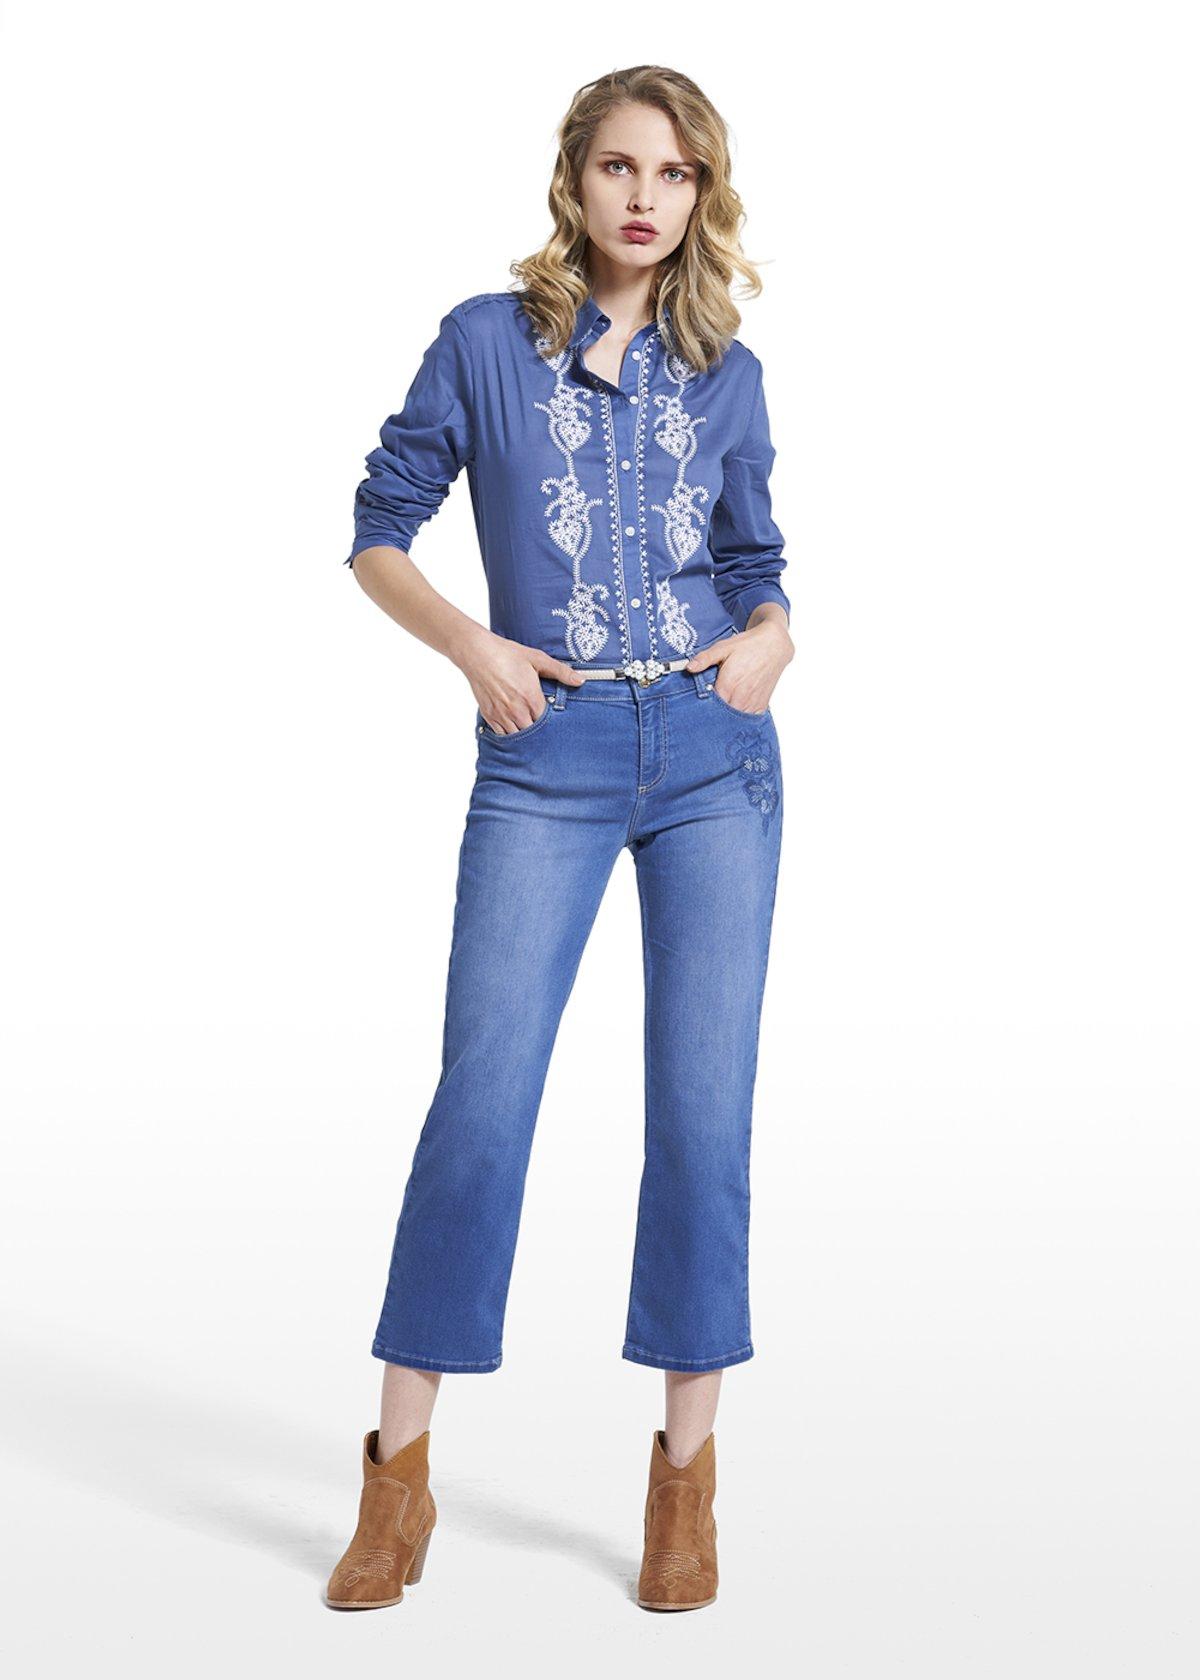 Jeans Pammy 5 tasche con gamba slim e ricamo flowers